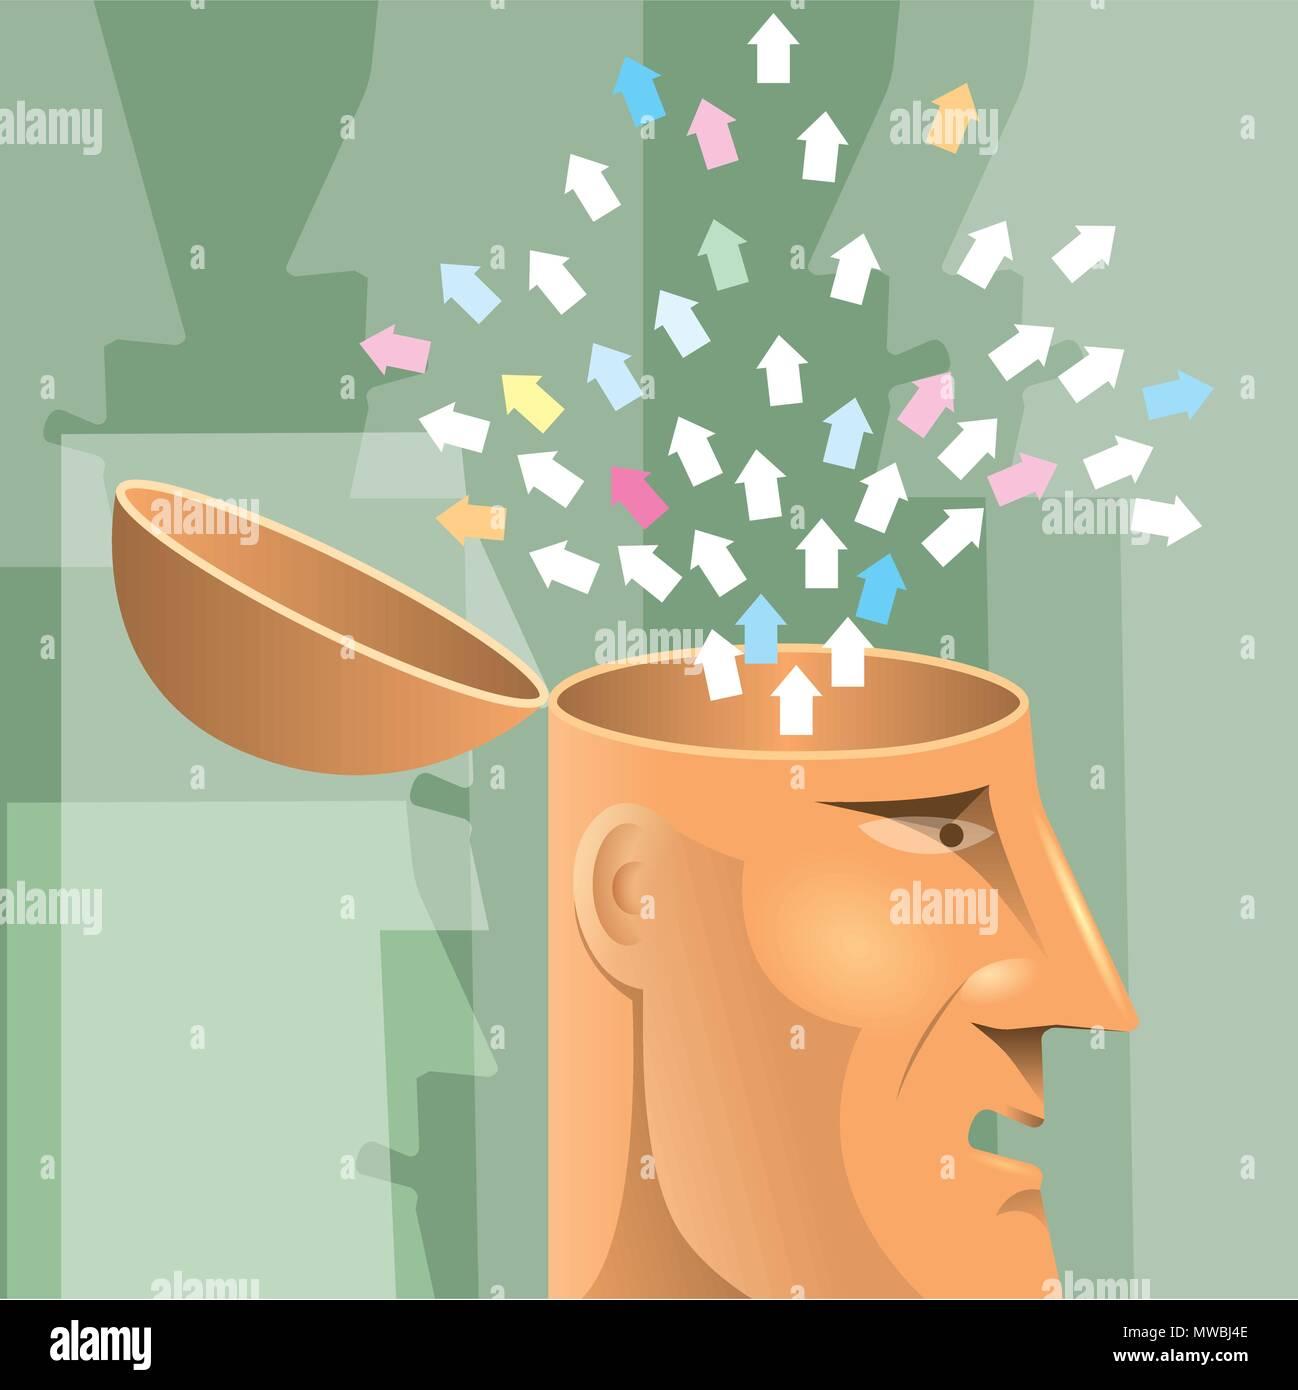 Artificial intelligence concept design, arrows in the brain. - Stock Vector